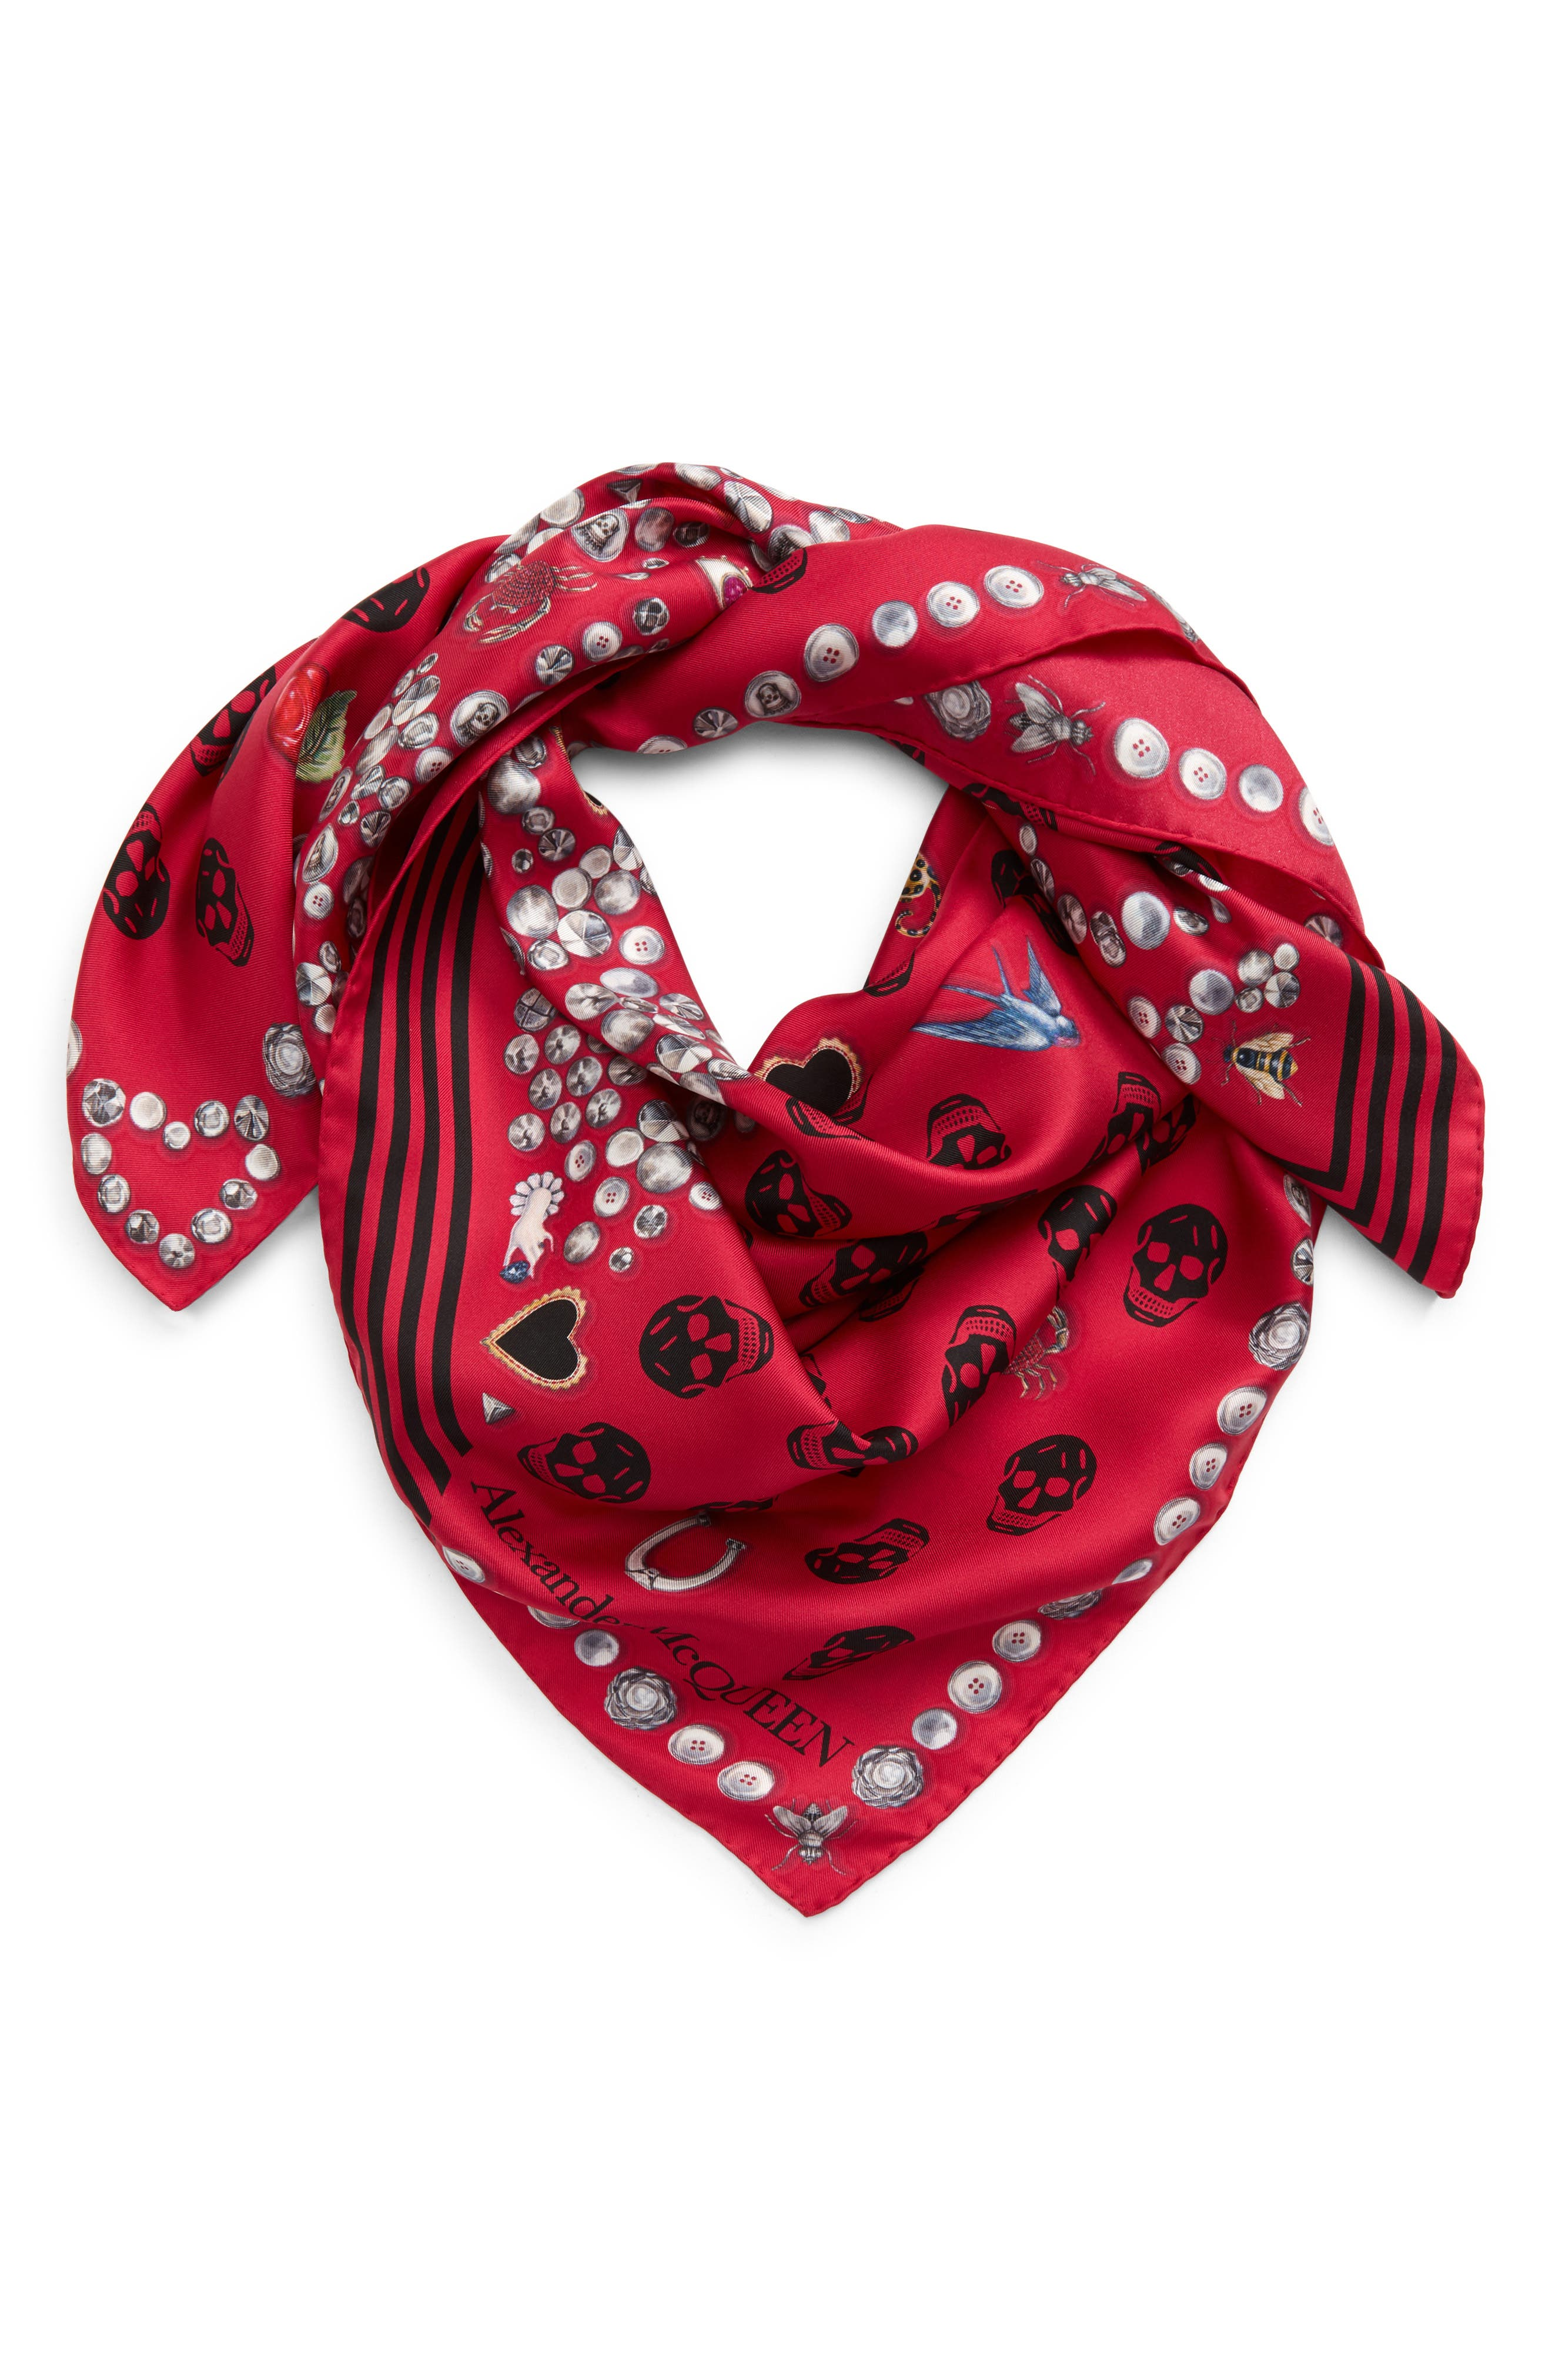 ZOMUSAR Fashion Women Square Head Scarf Wraps Scarves Ladies Printed Kerchief Neck Scarf